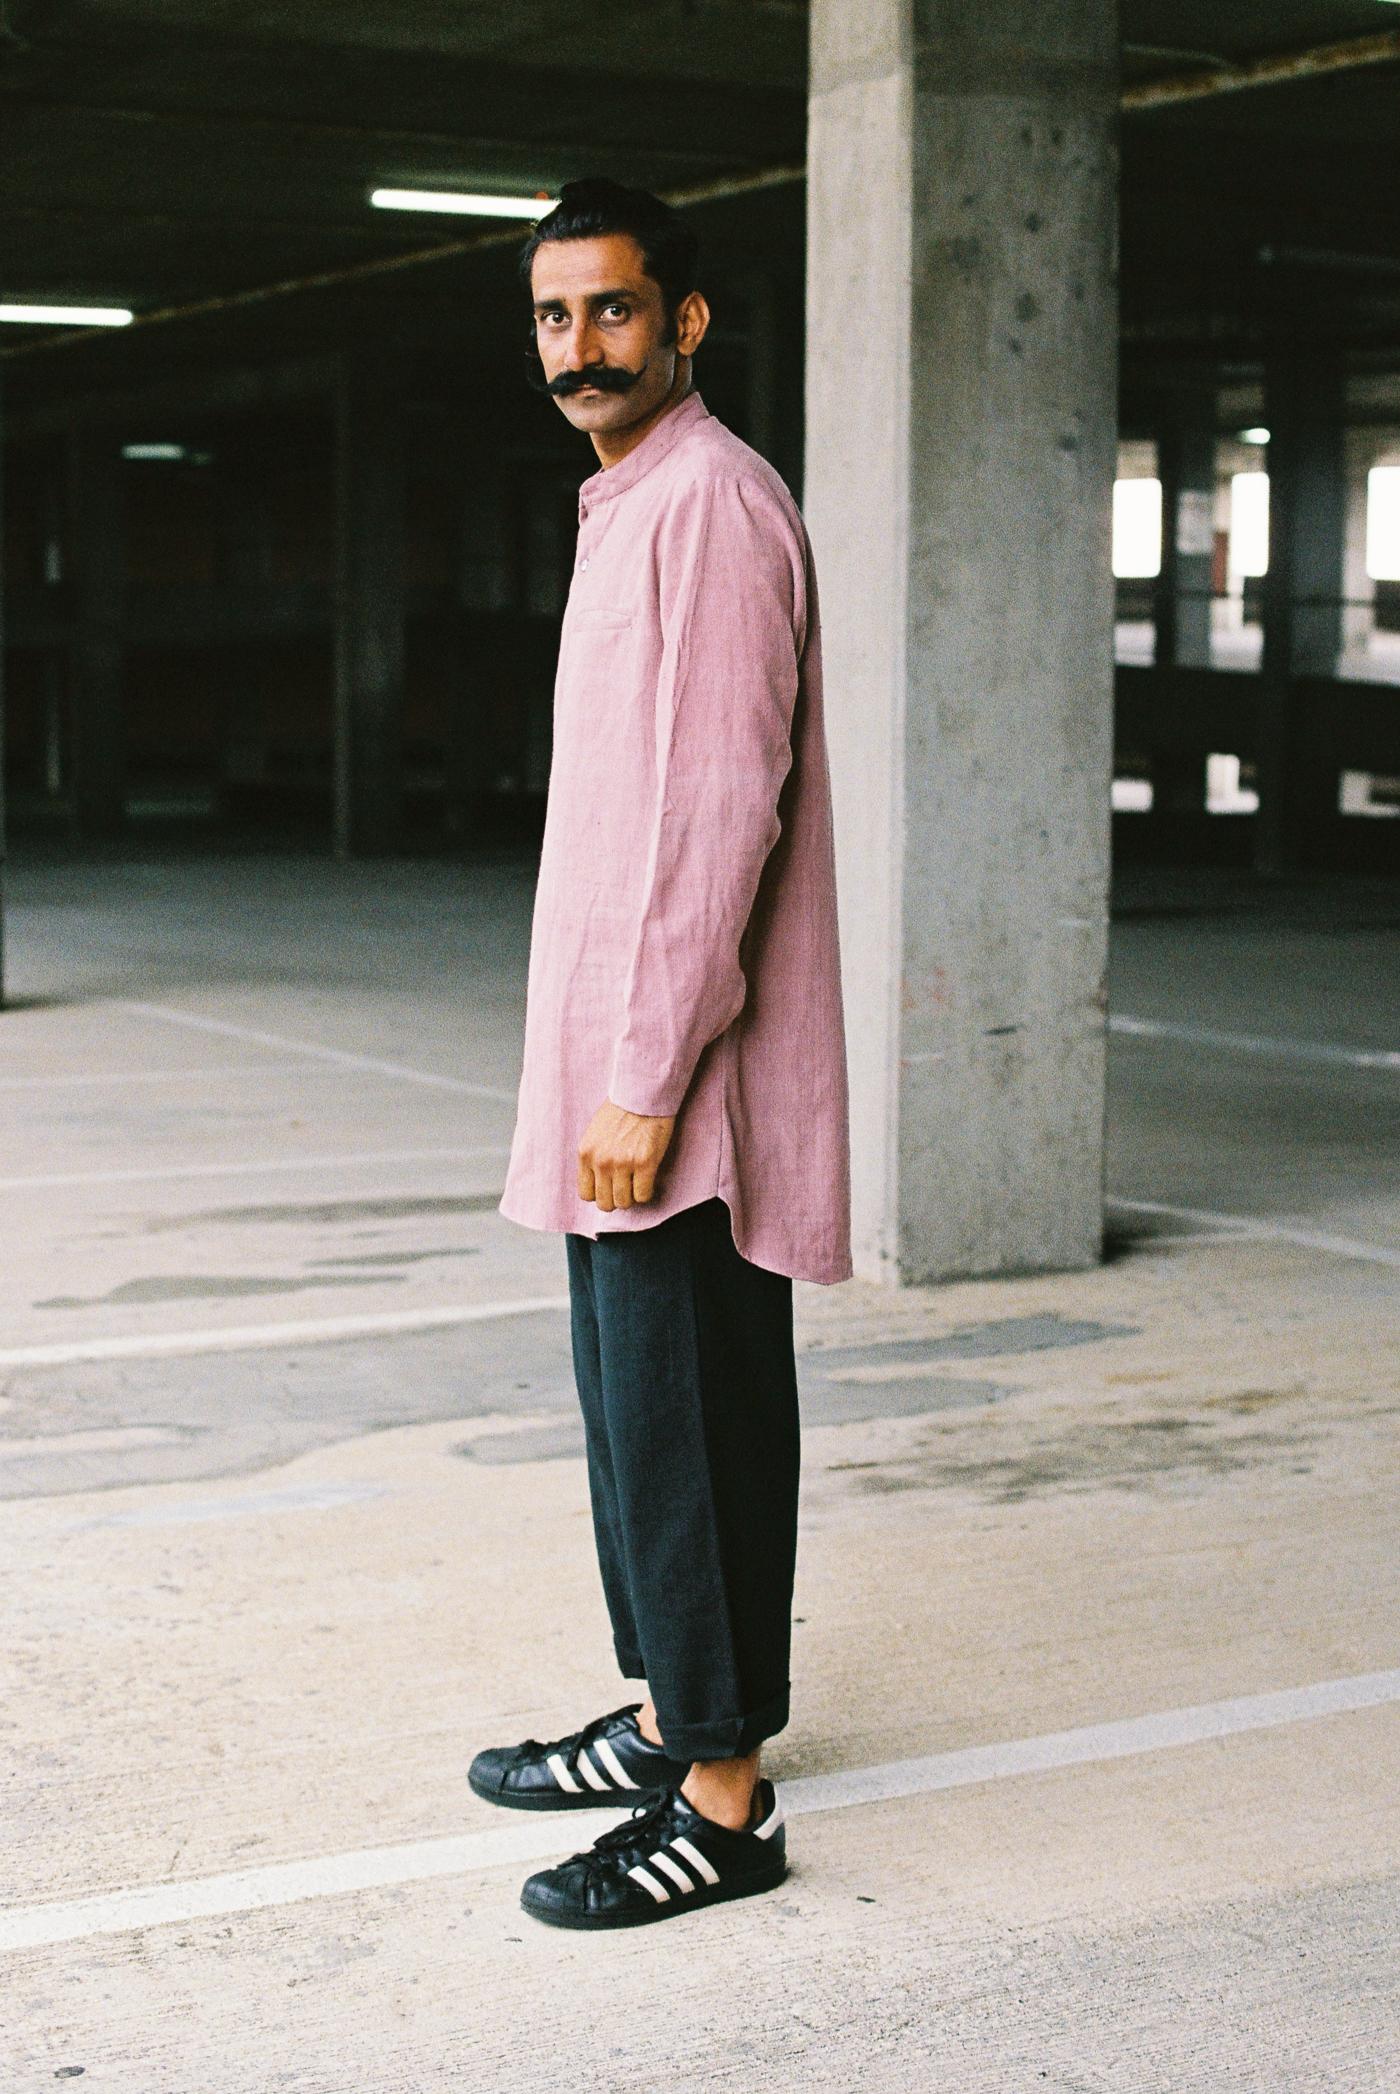 pinkshirtblackpants-4.jpg